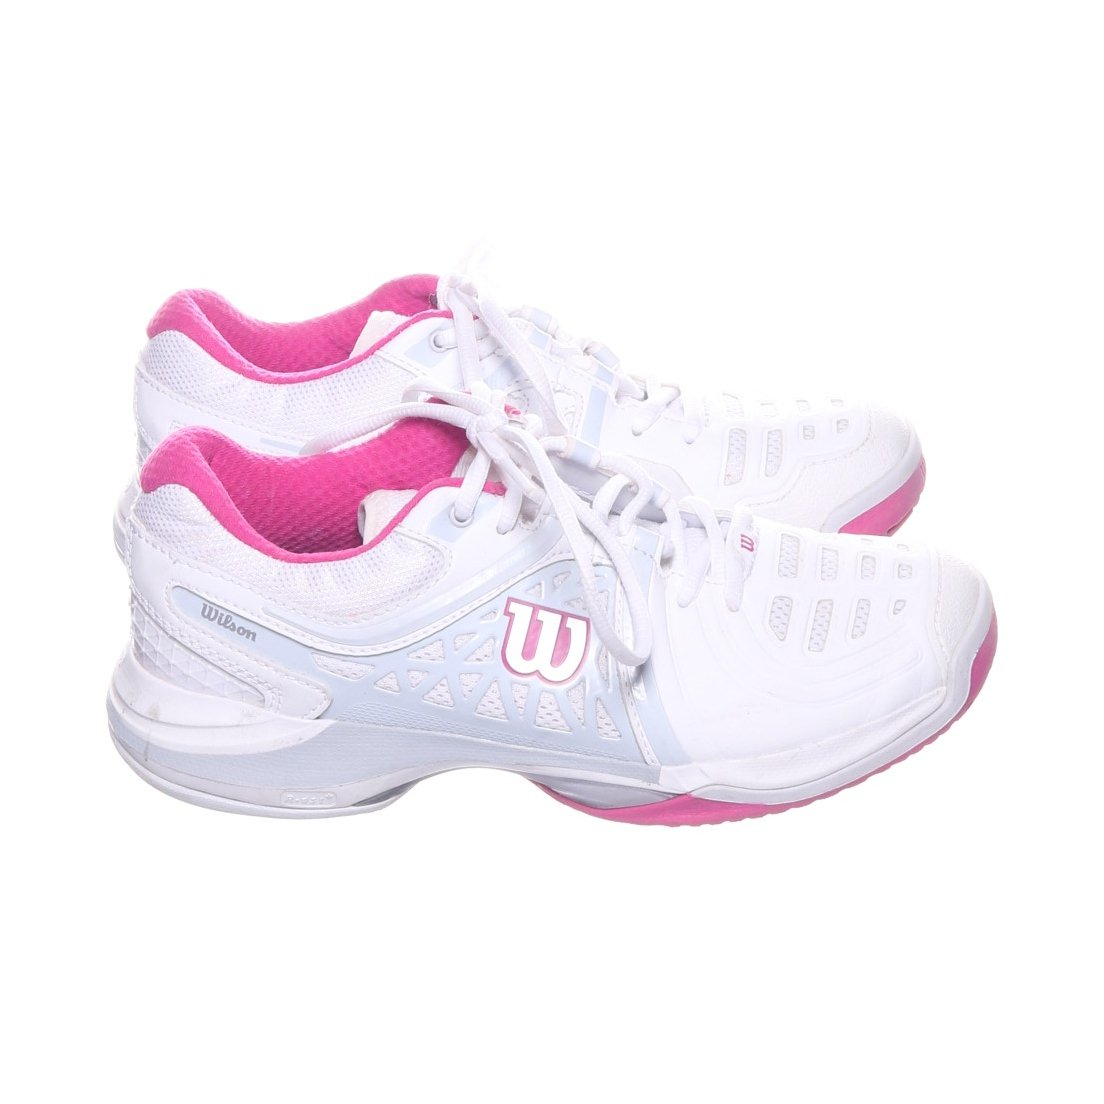 1f2f8a3c49f Wilson, Sneakers, Strl: 37.5, Tennis skor.. (347459055) ᐈ Sellpy på ...